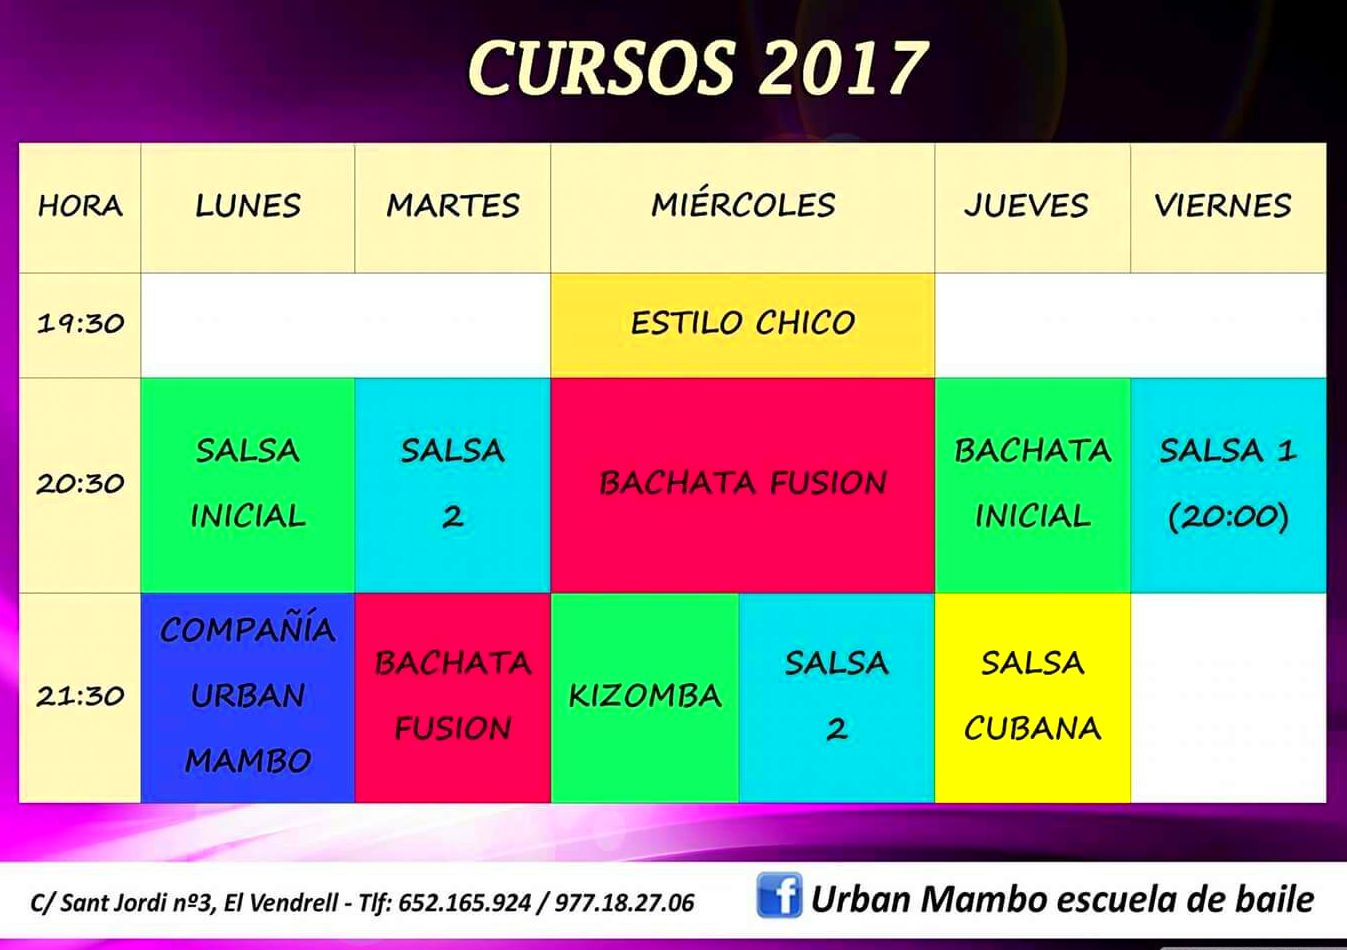 GIMNÁS RECORD CURSOS 2017